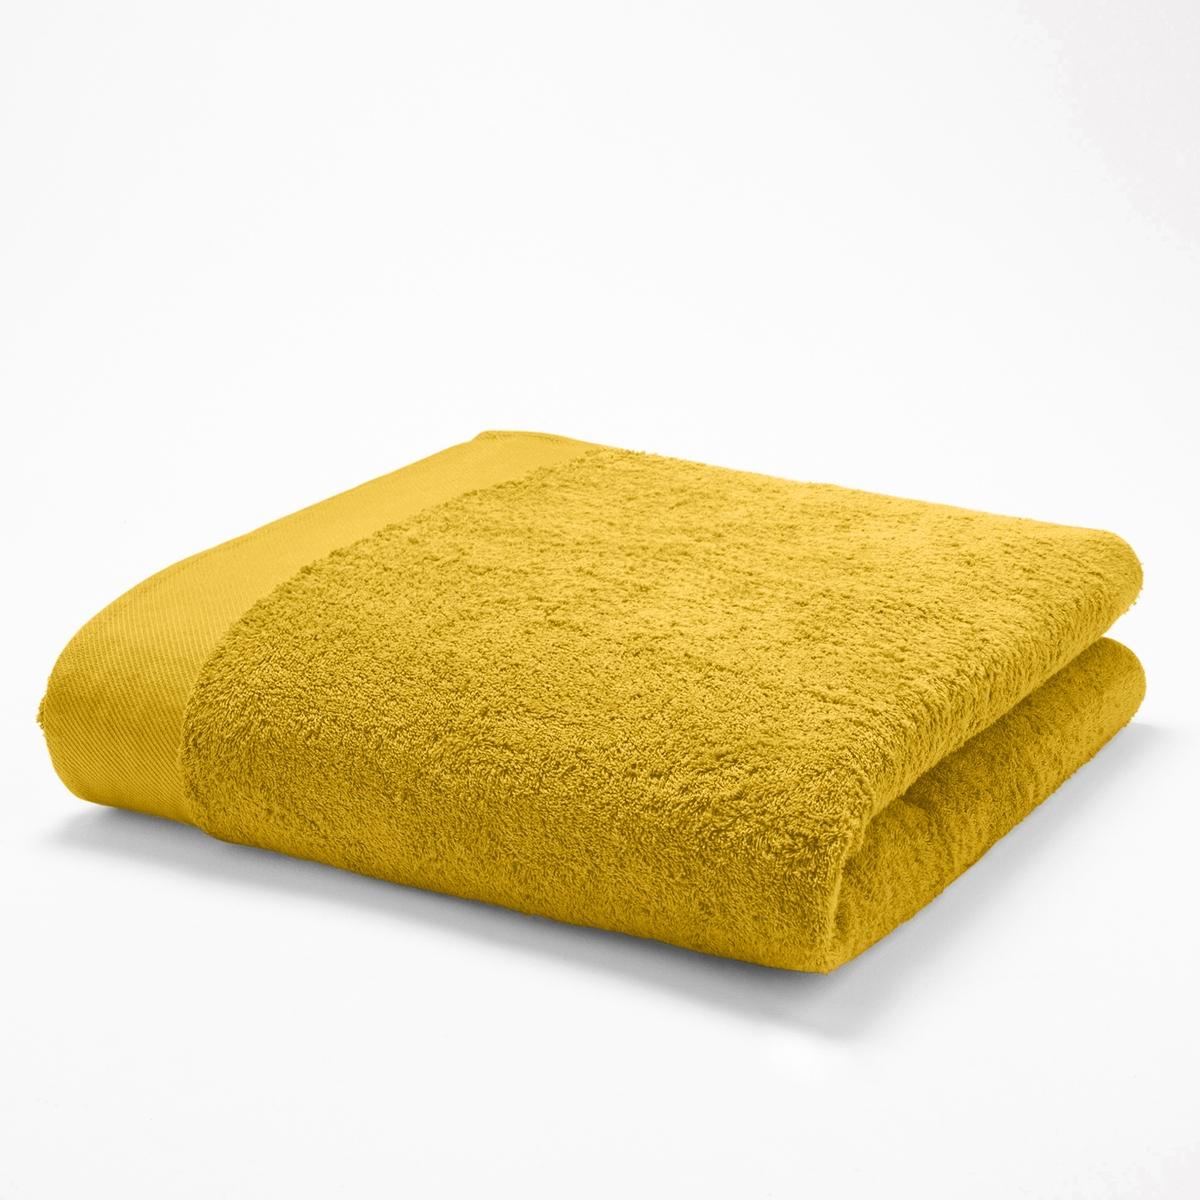 Полотенце банноеМягкая махровая ткань, 100% хлопка, 500 г/м2. Кайма диагональ. Стирка при 60°. 70 х 140 см.<br><br>Цвет: желтый шафран